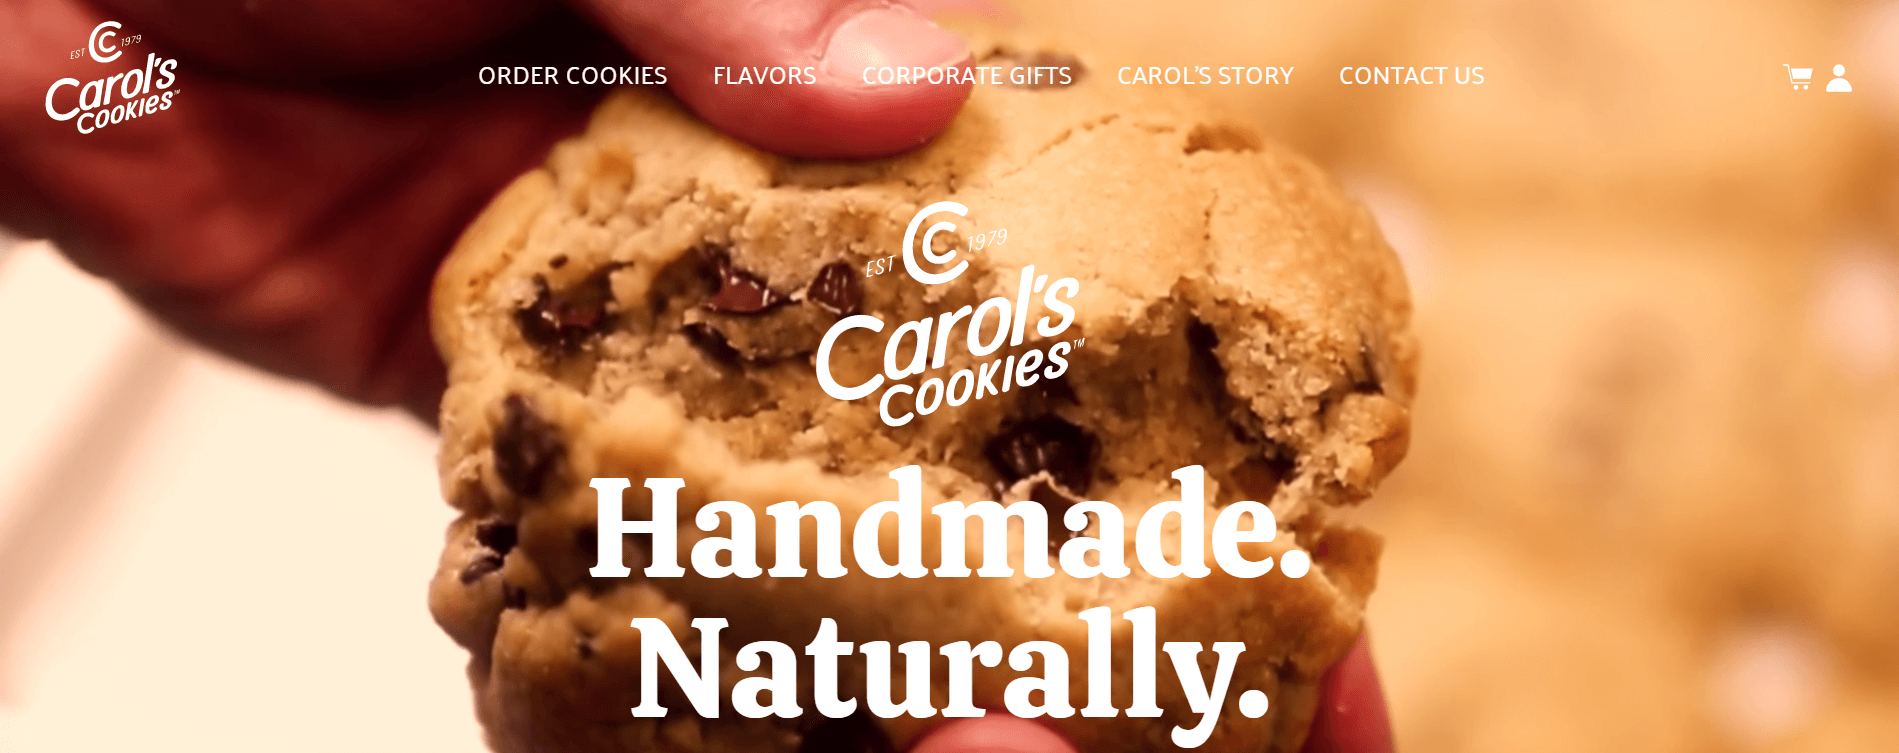 carols cookies home page